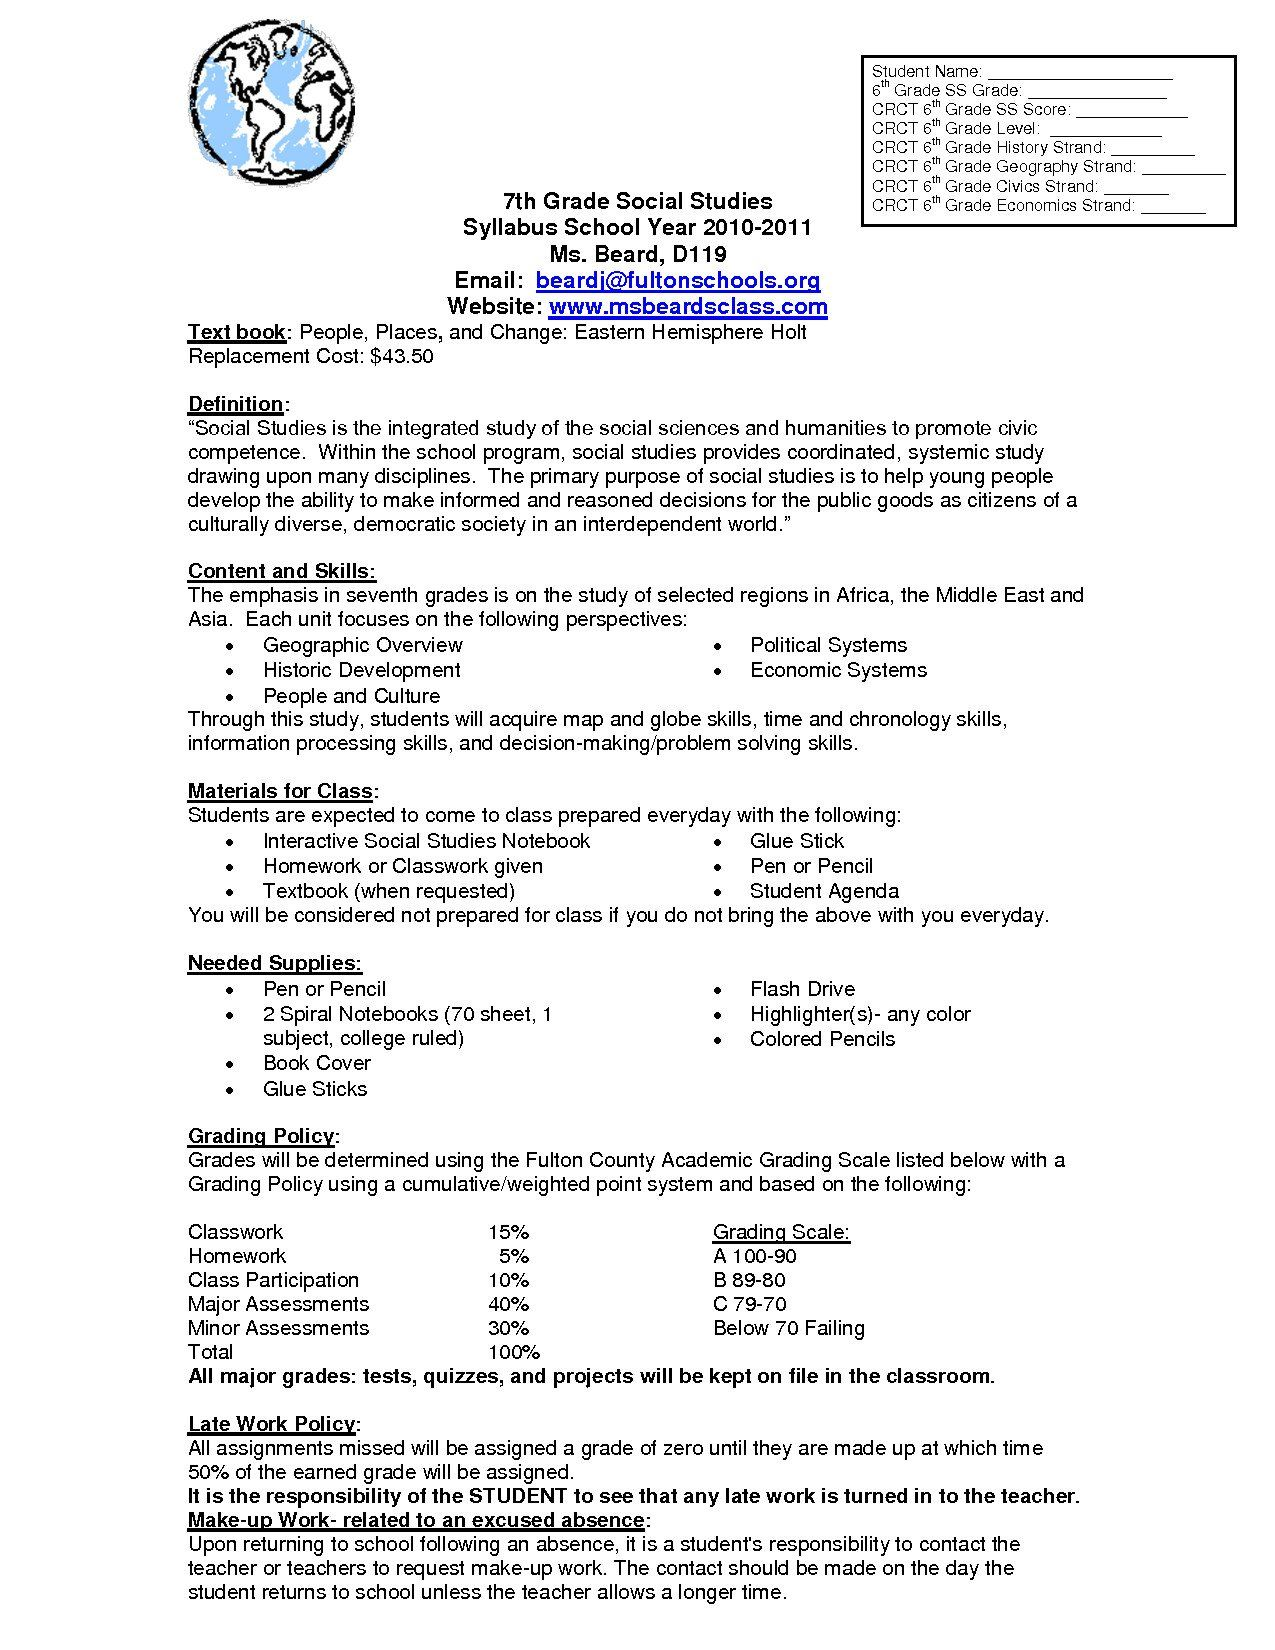 9th Grade Social Studies Worksheets Best Social Stu S For 7th Graders Worksheet In 2020 Social Studies Worksheets History Worksheets 7th Grade Social Studies